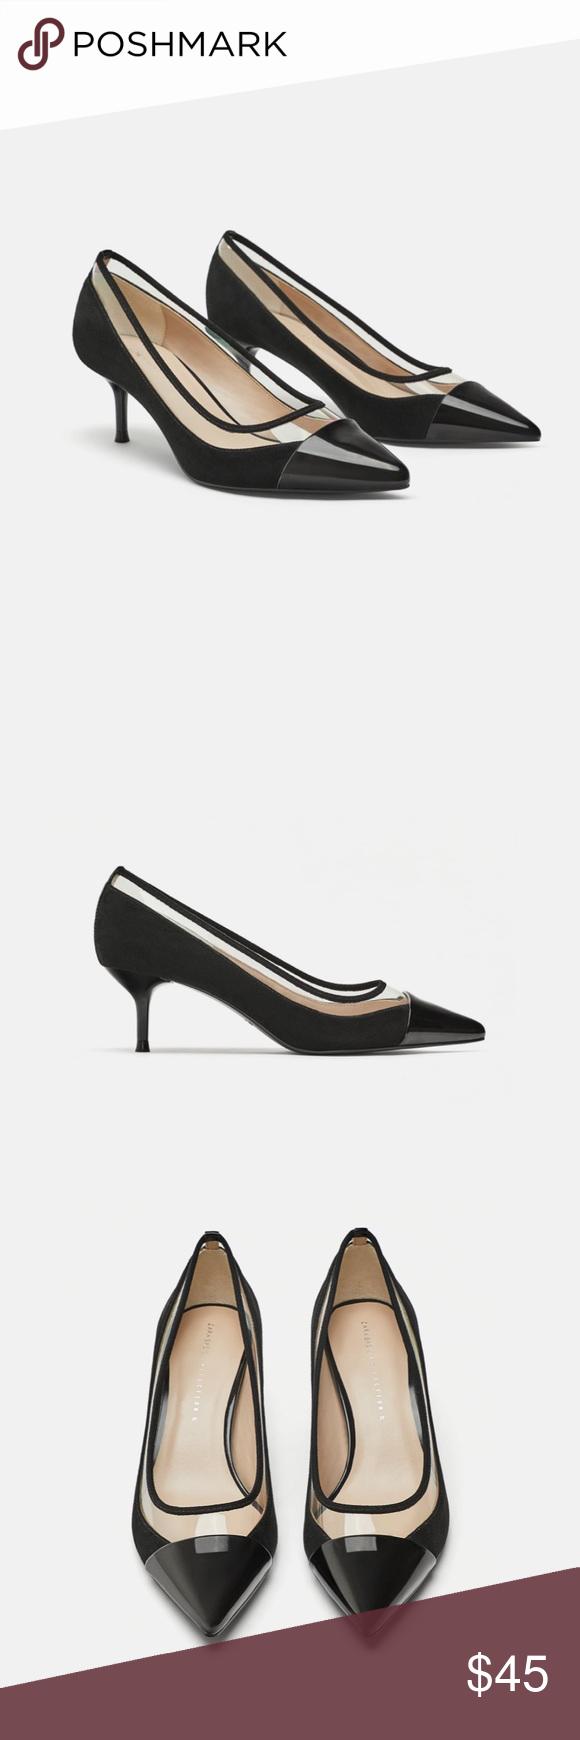 76bbcb17717 NWT Zara Mid-Height Heels with Vinyl New with Tag Zara Mid-Height Heels